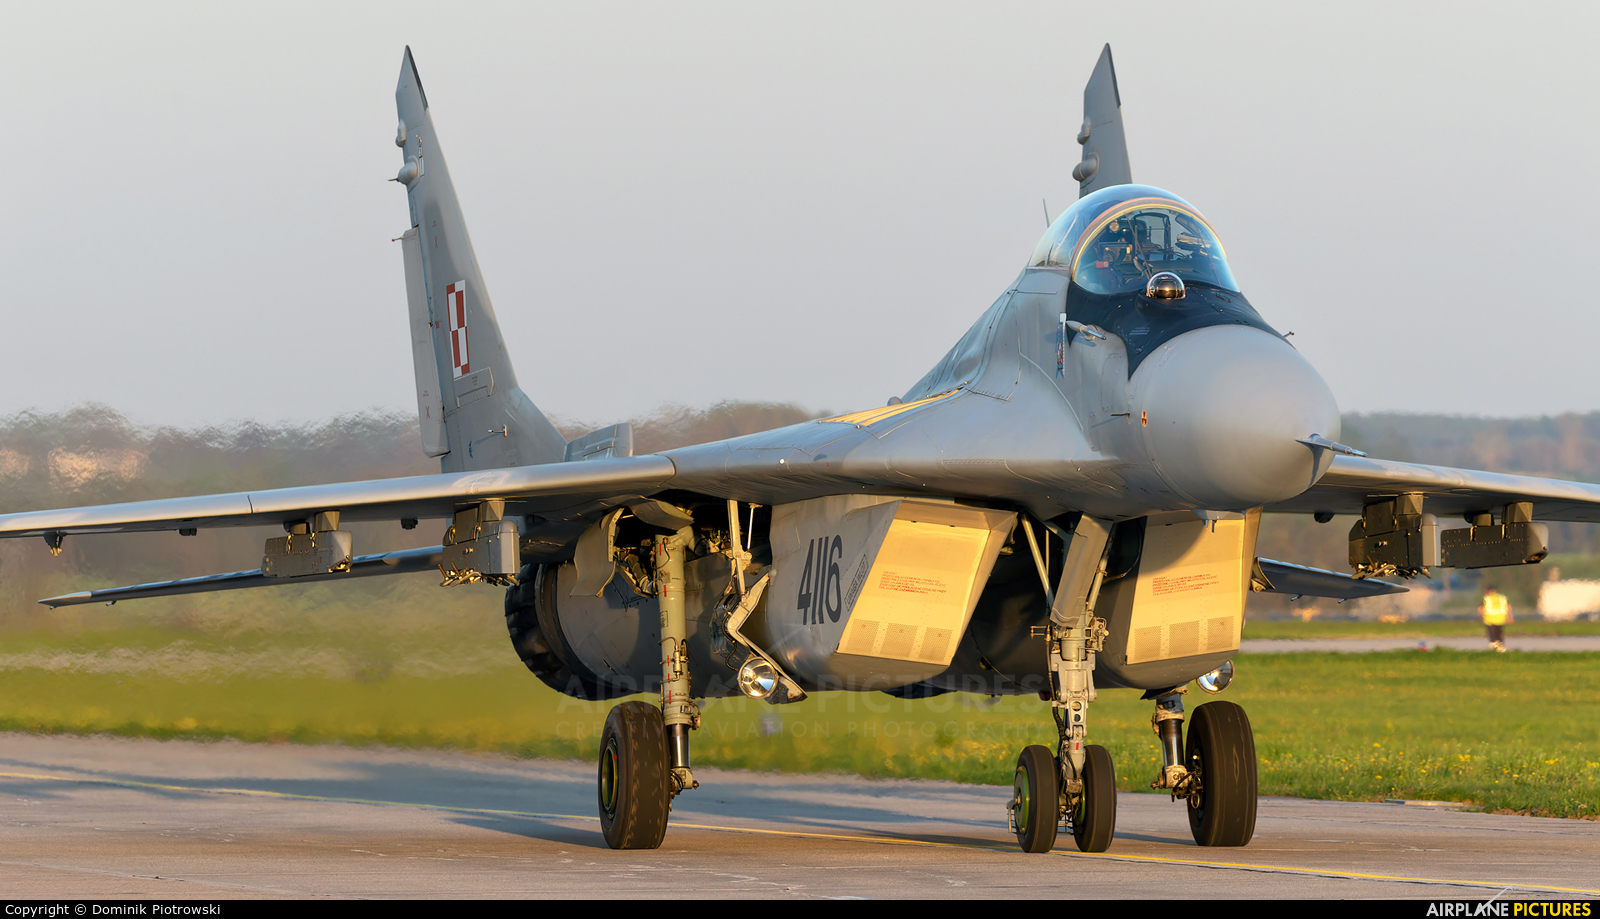 Poland - Air Force 4116 aircraft at Świdwin